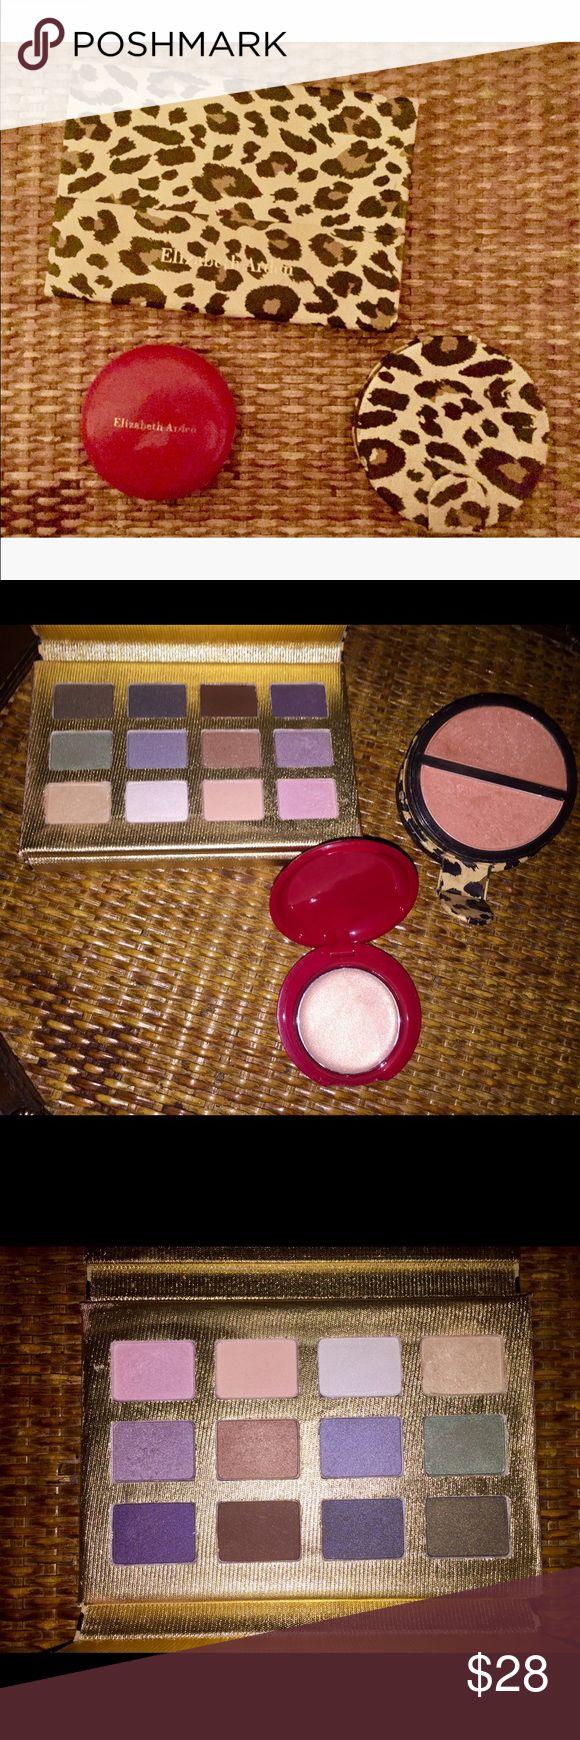 💋🔥BRAND NEW & NEVER USED3 Pc.Elizabeth Arden Set Includes Eyeshadow Palette, Blush Palette & Shimmer Cream Elizabeth Arden Makeup